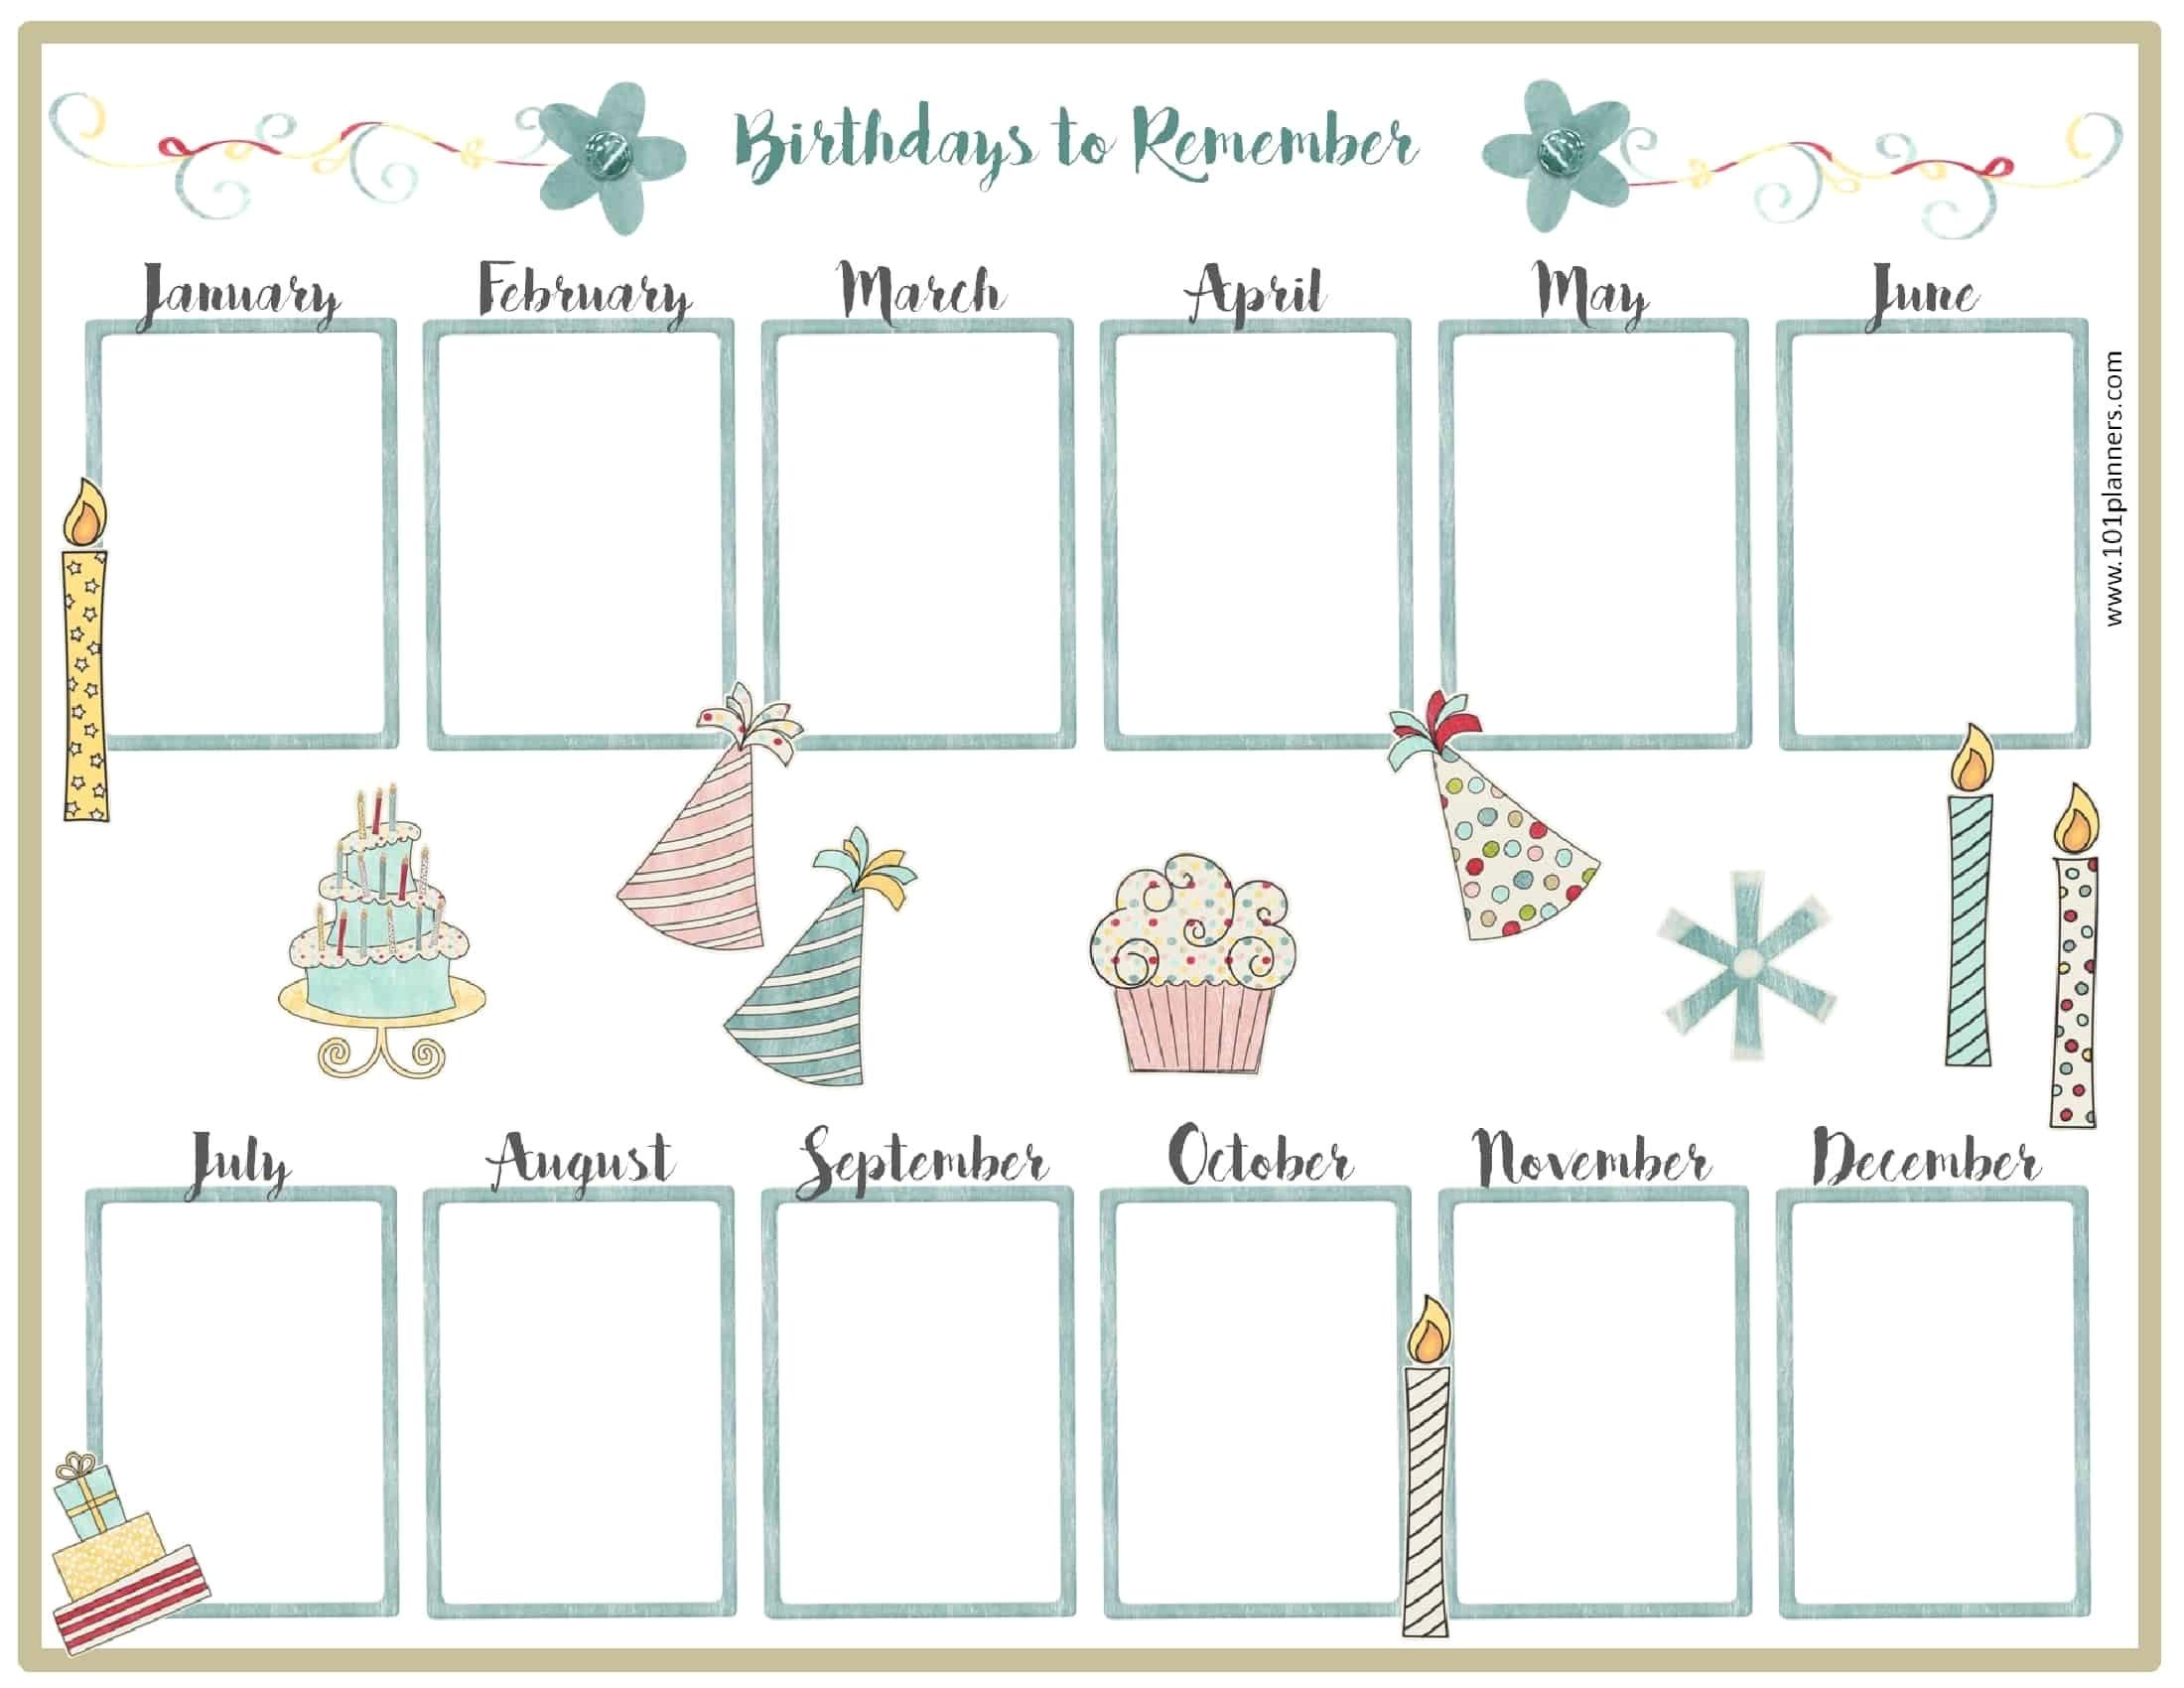 Birthday Calendar Template Excel Free Birthday Calendar Customize for Free 12 Month Birthday Calendar Template